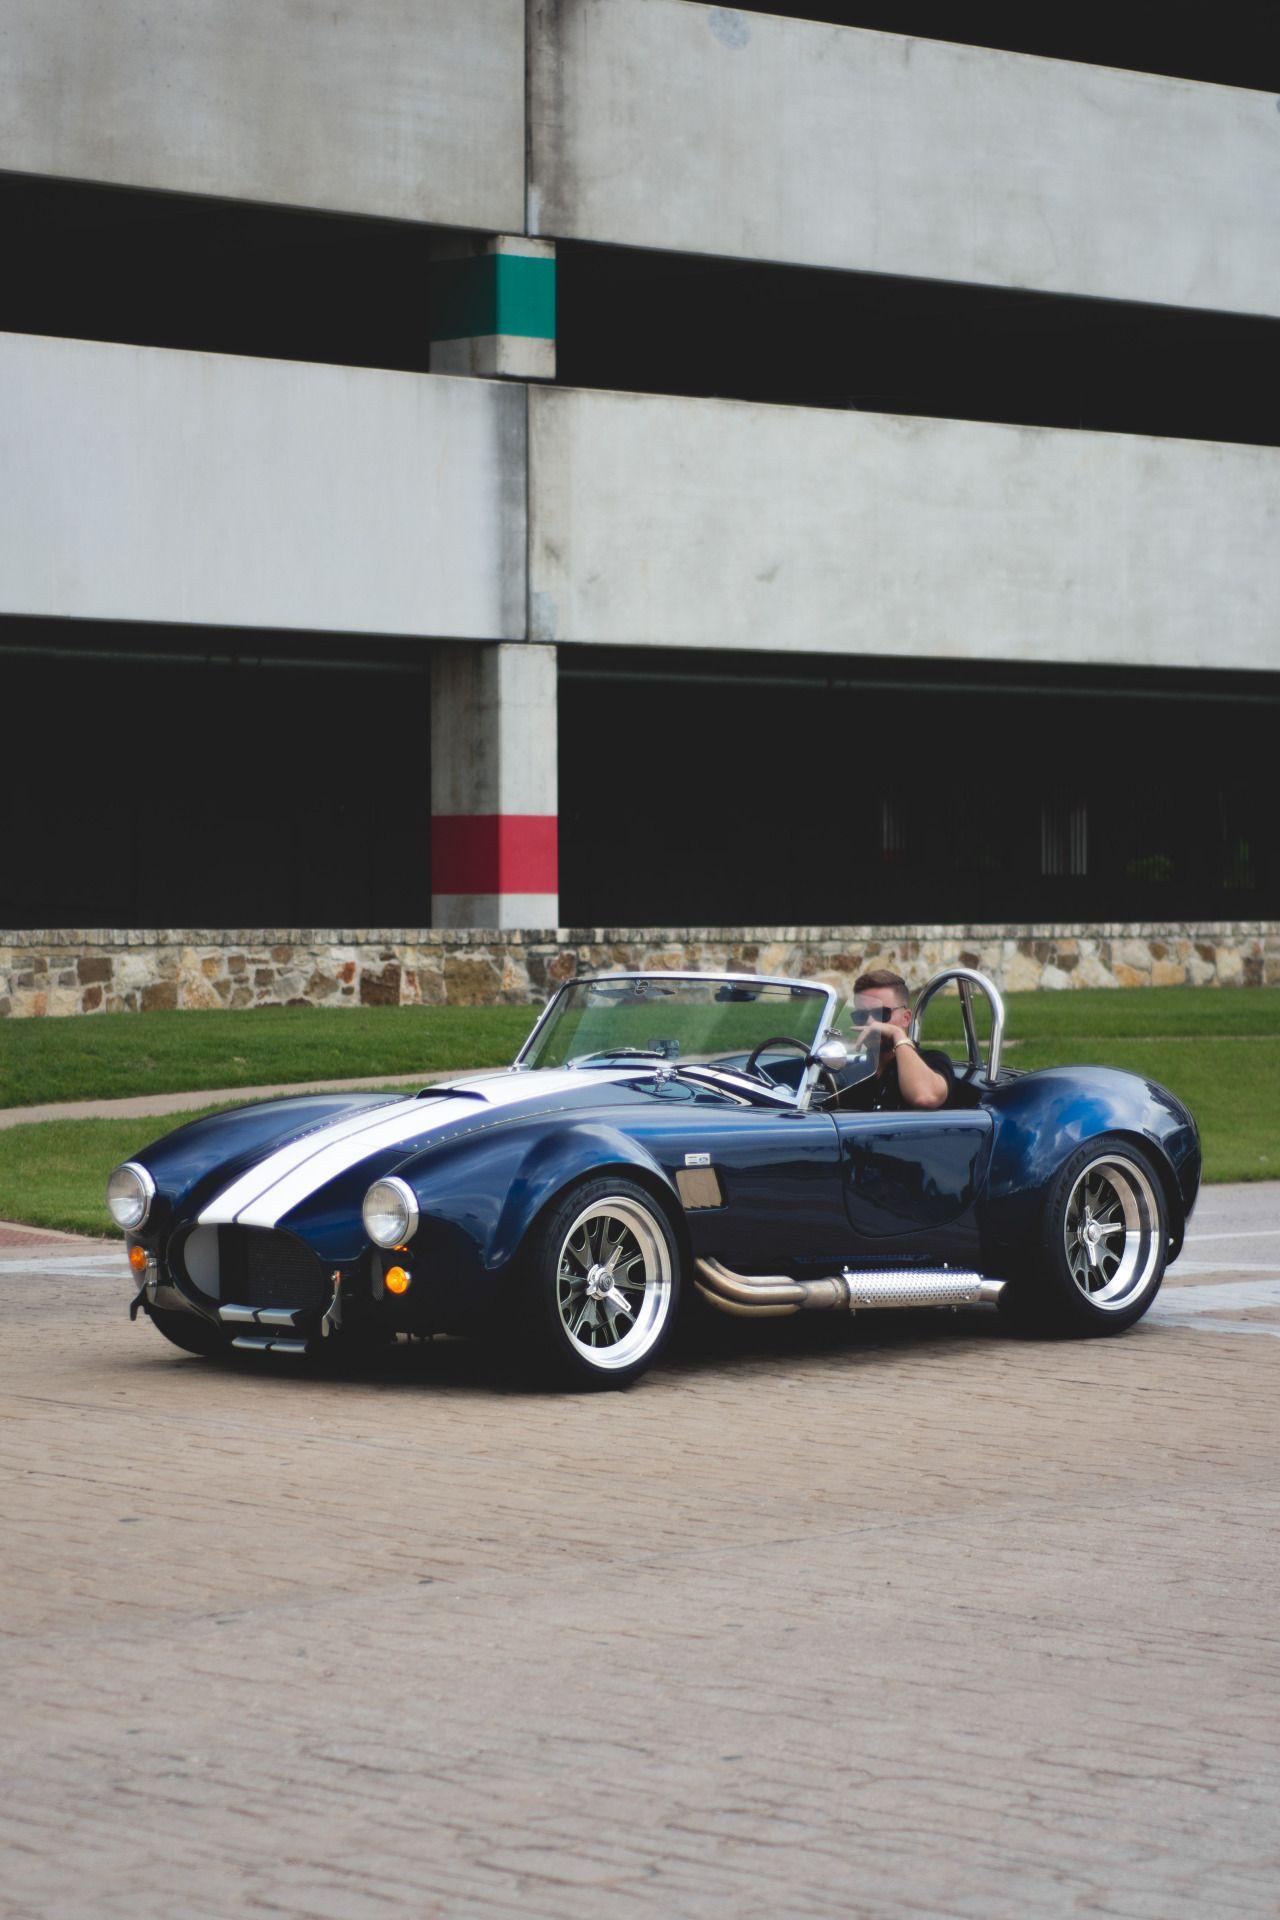 Ac shelby cobra 427 hot wheels pinterest cars ac cobra and sports cars